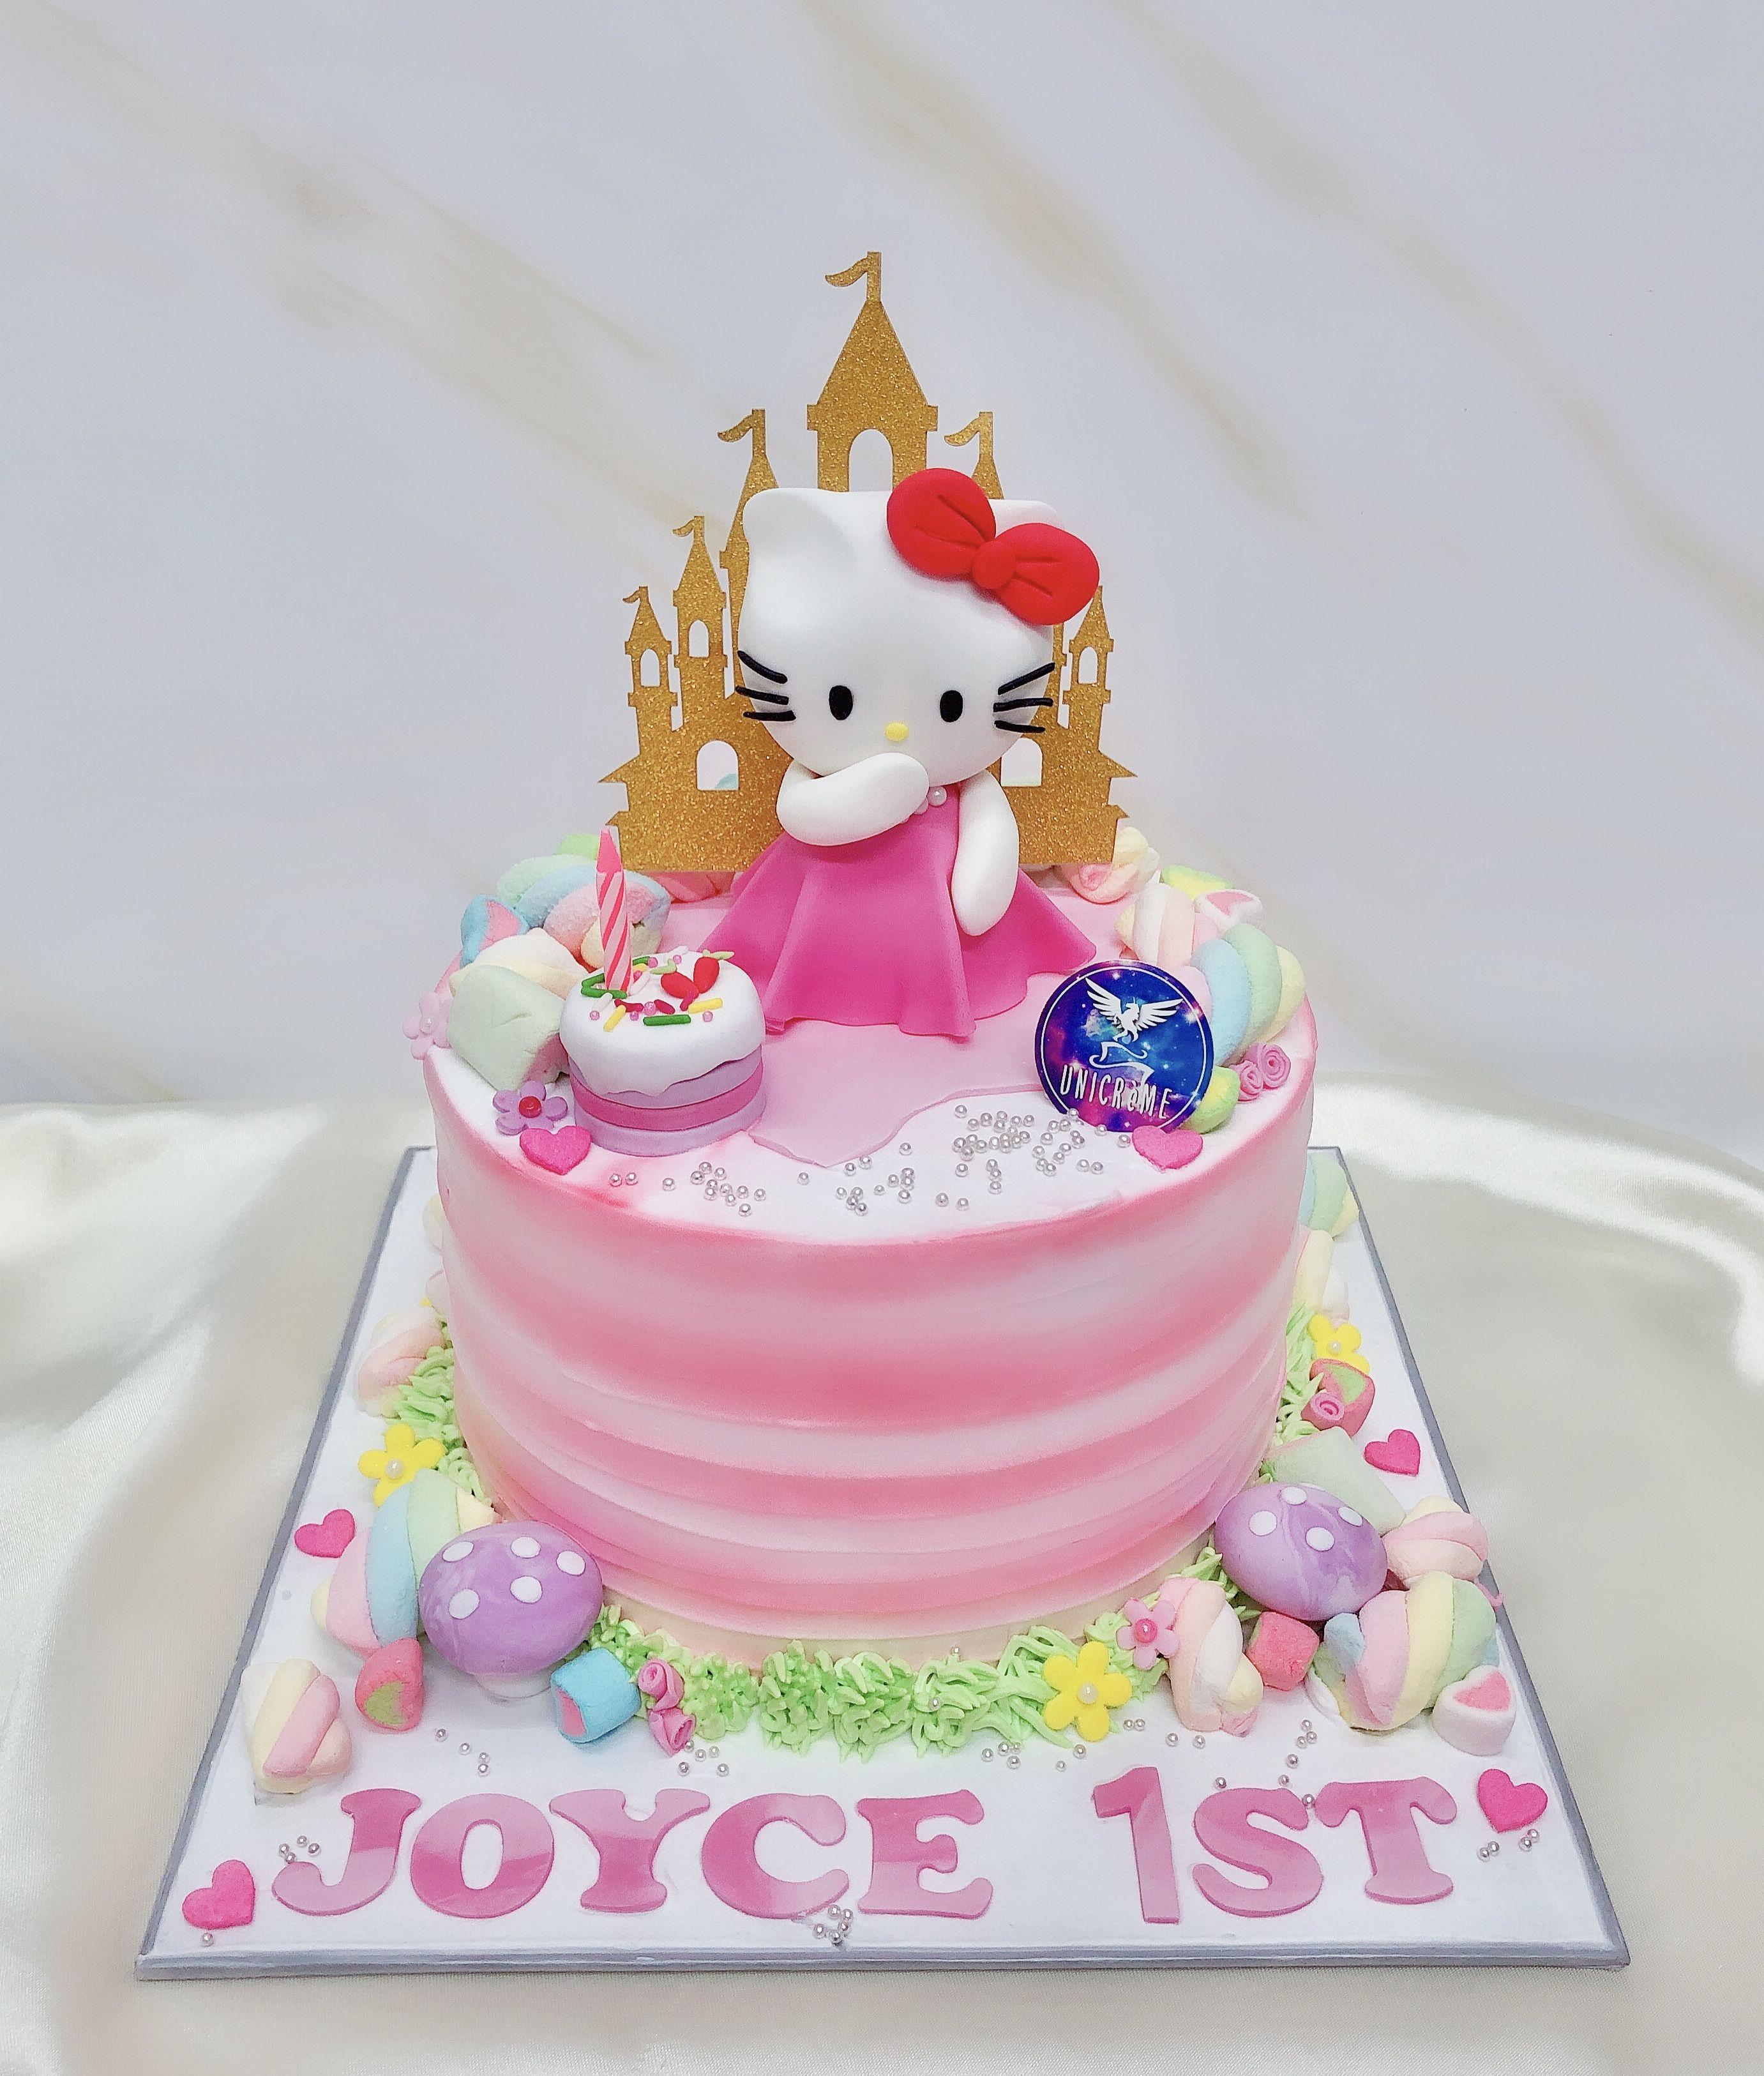 Kids' Favourite Cakes Design 😍 小朋友最爱的蛋糕造型💕 欢迎预订客制化蛋糕,拉钱蛋糕